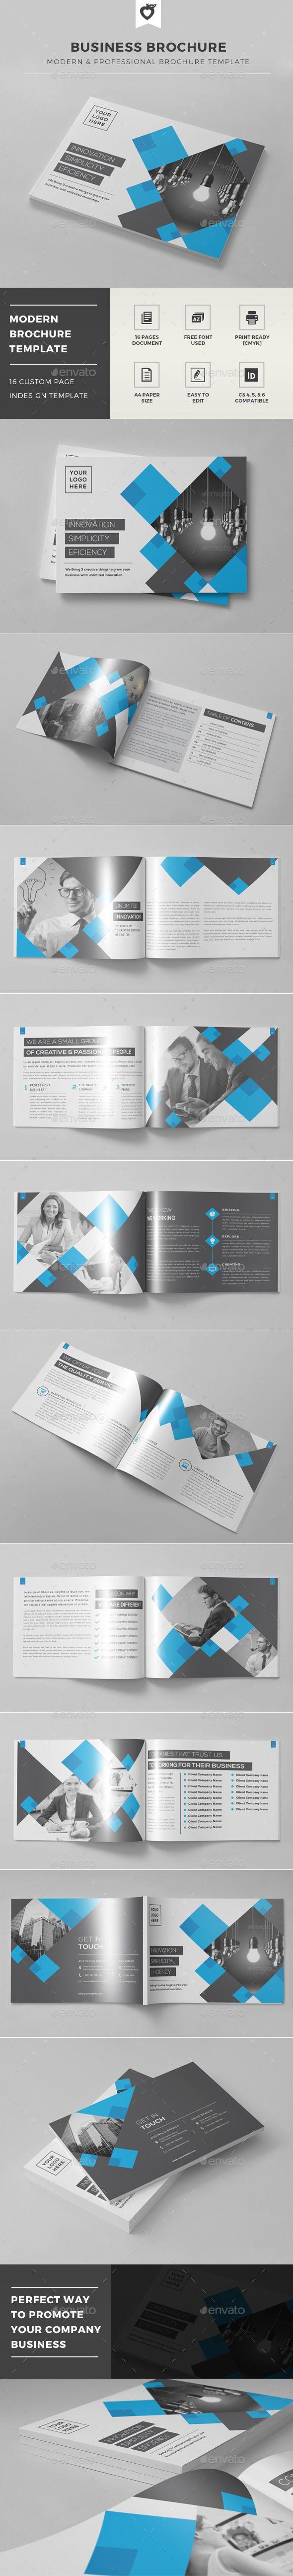 Business Brochure Template #design #broschüre Download: http://graphicriver.net/item/business-brochure-template/12371987?ref=ksioks